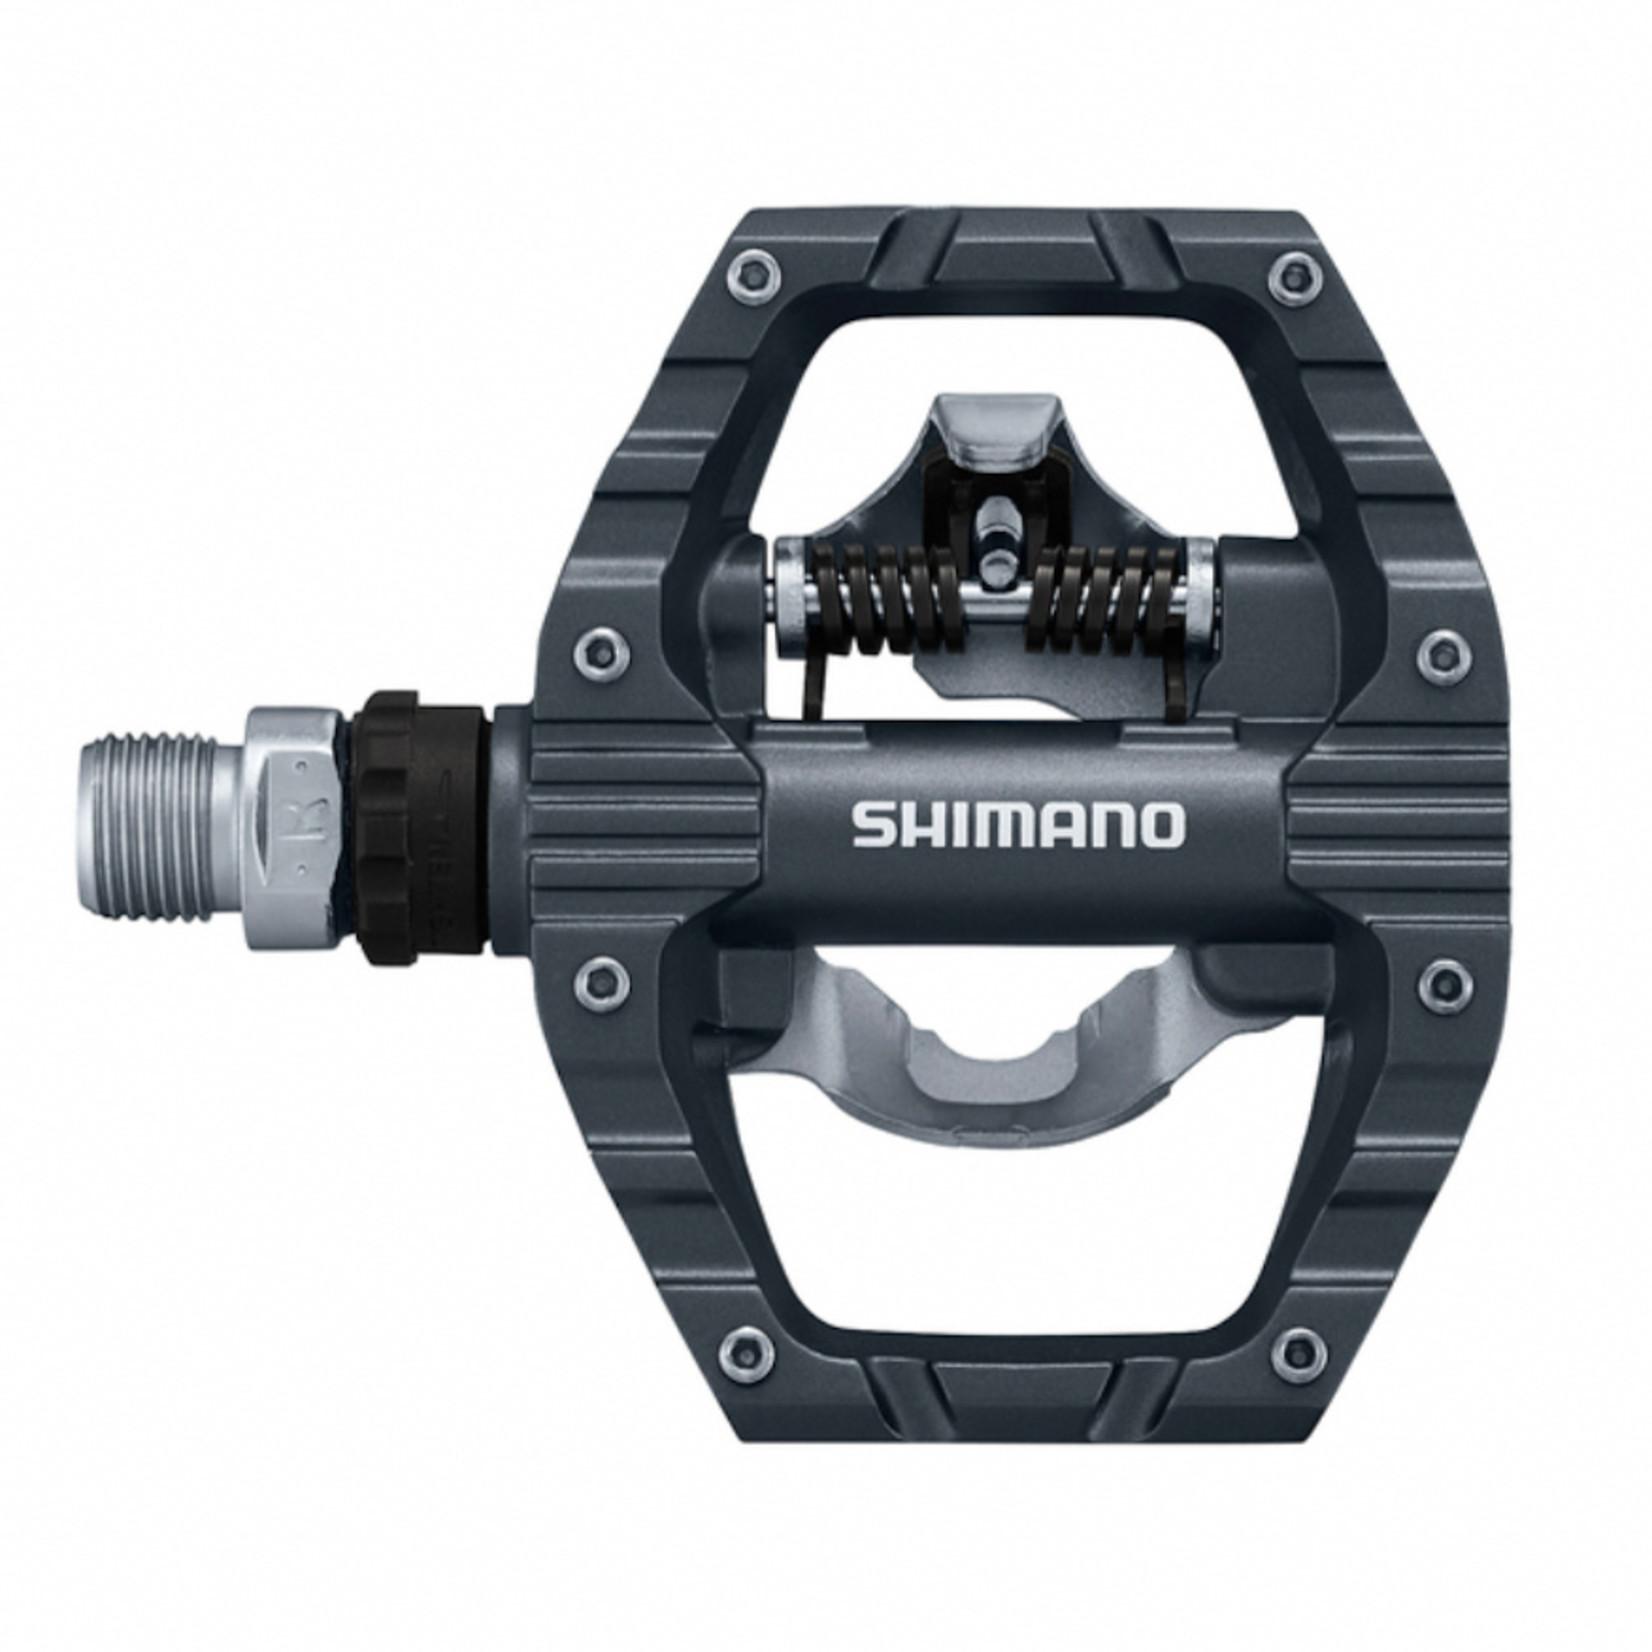 SHIMANO Shimano PD-EH500 Black SPD Dual Platform Pedals